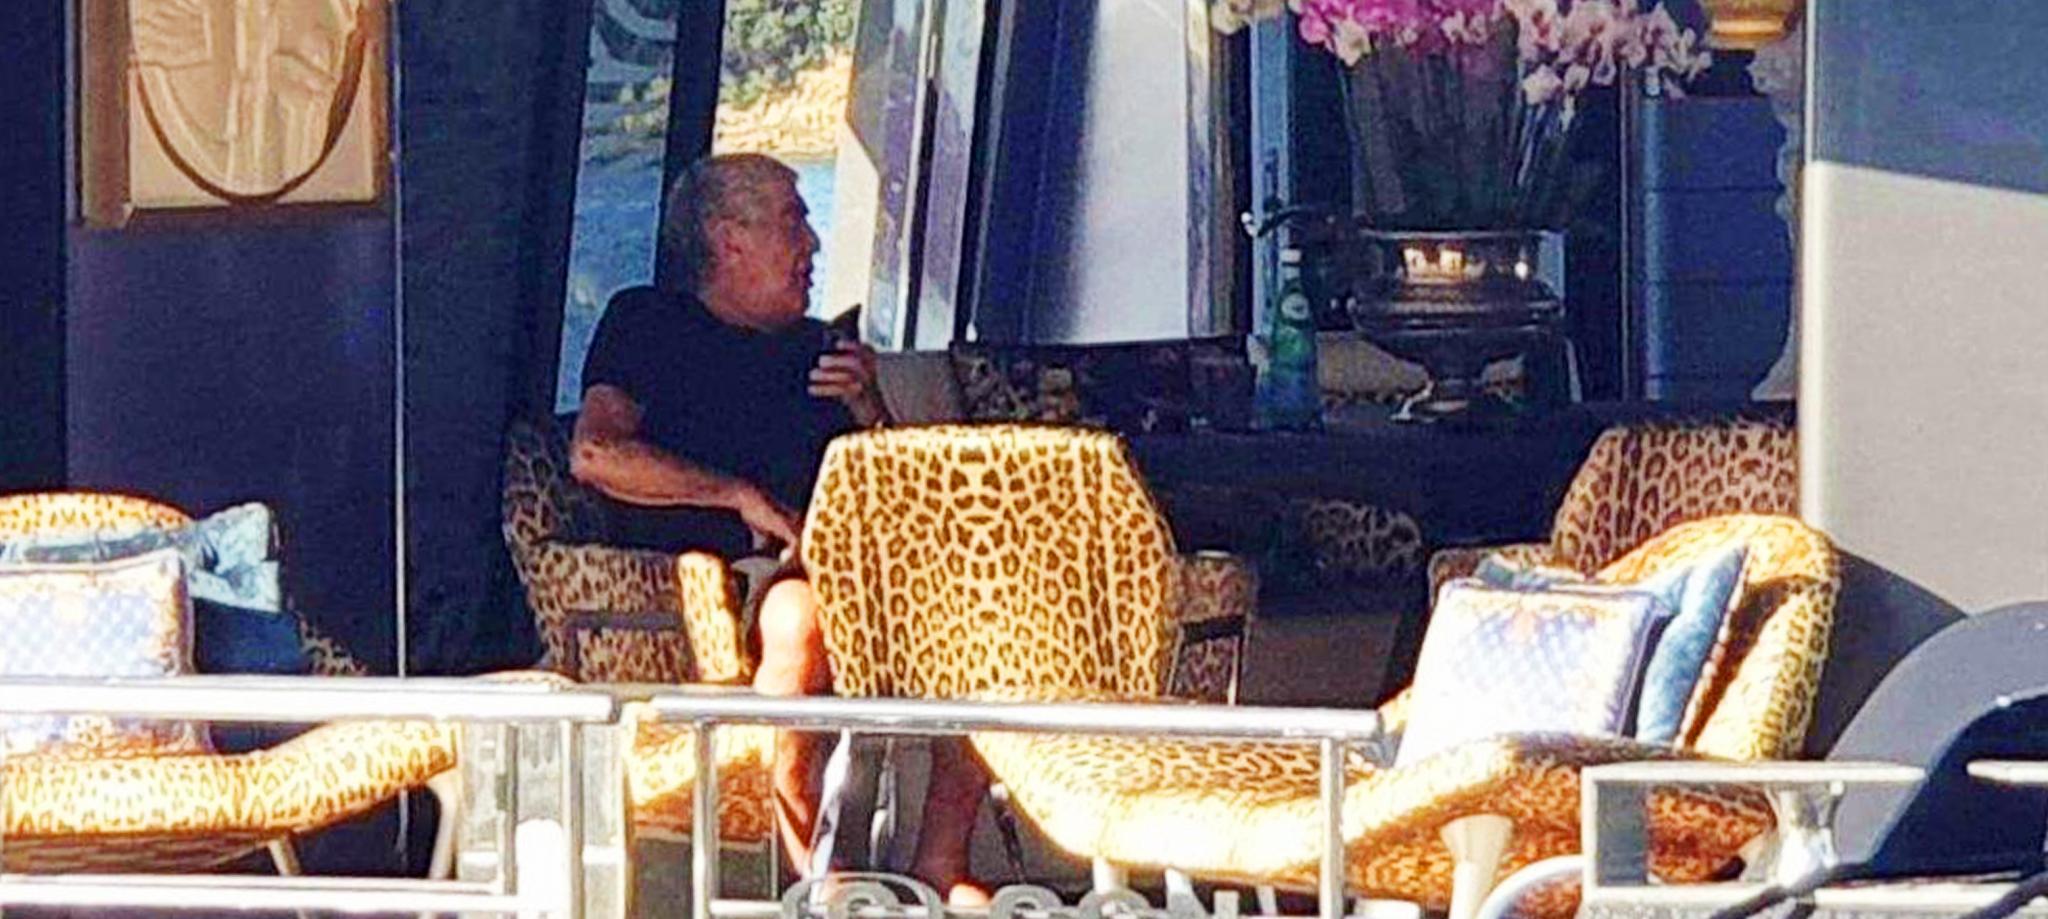 MALLORCA. YATES. Roberto Cavalli llega a la Isla con el 'Freedom'.